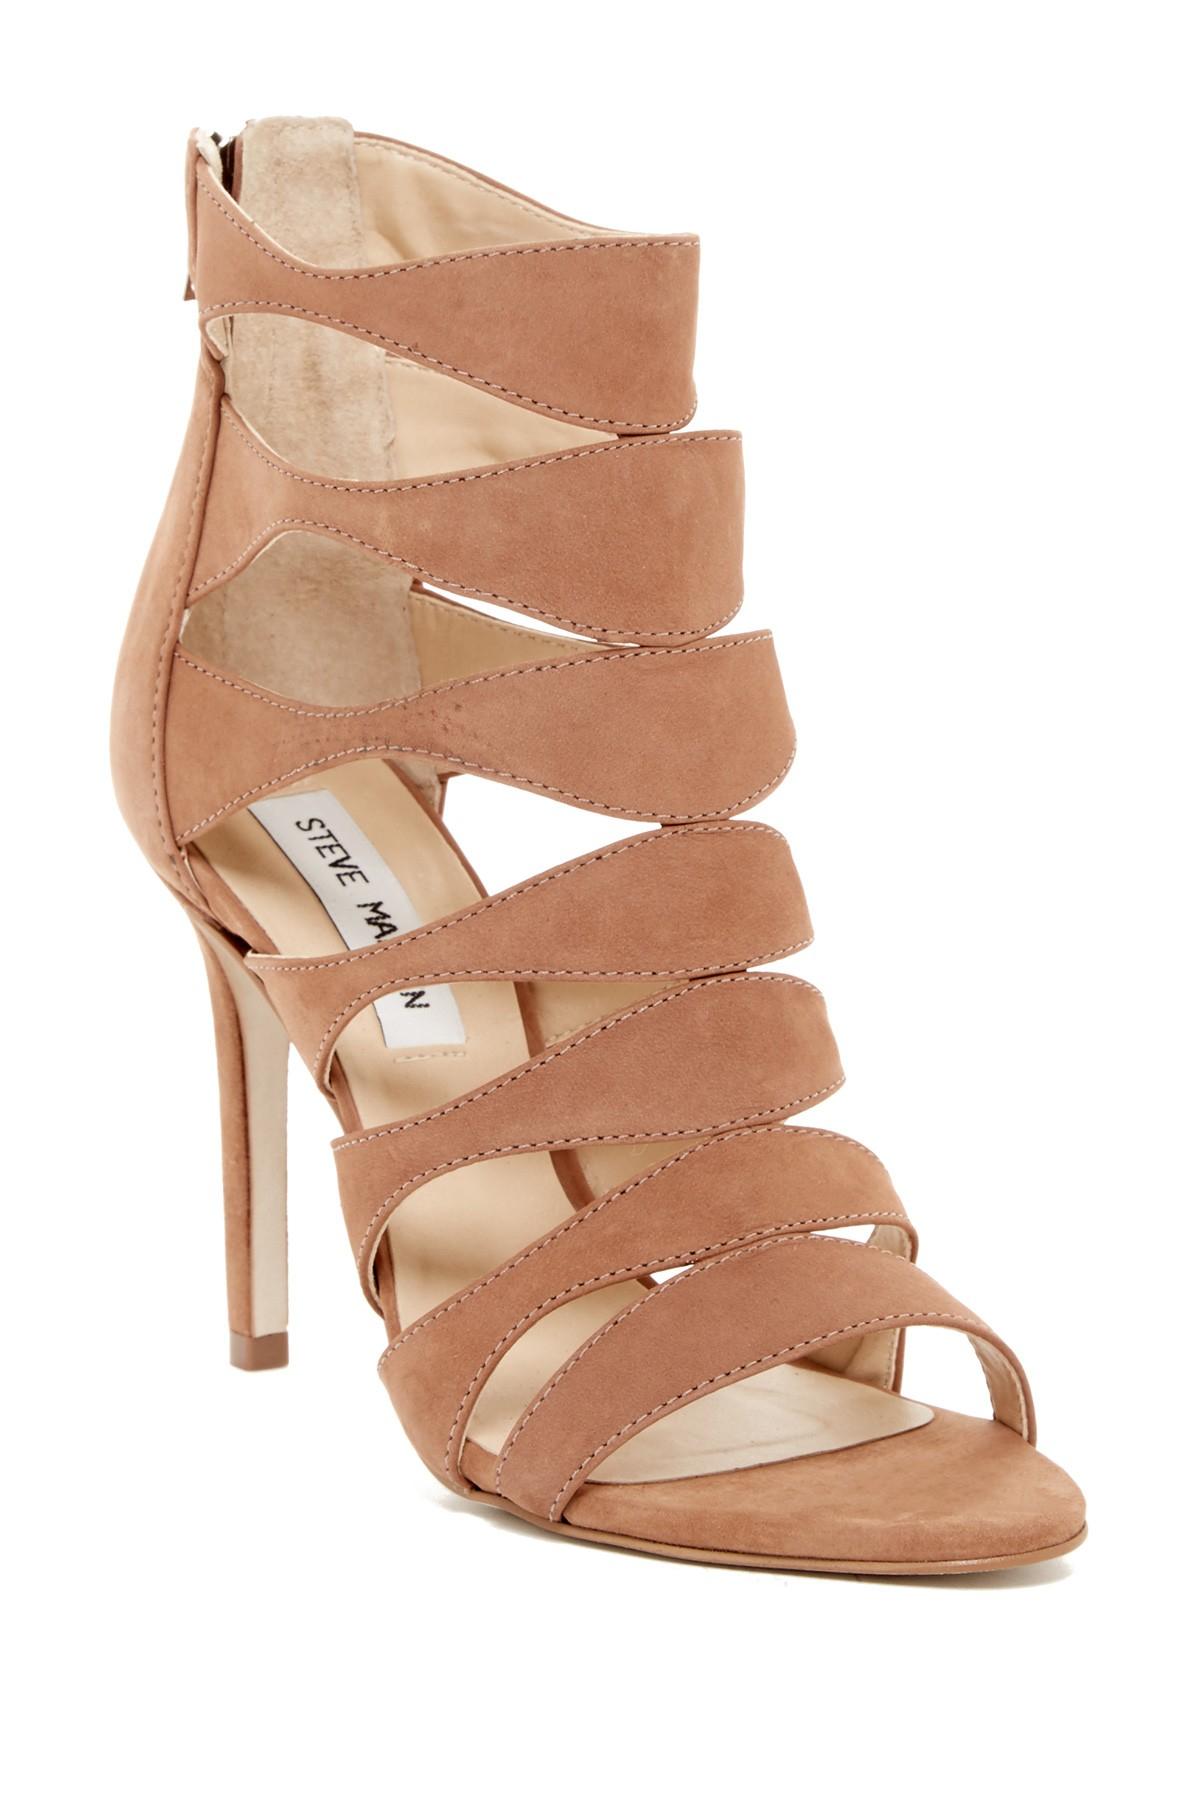 6dcfc53629cf Lyst Steve Madden Swyndlee Cutout Sandal In Brown. Steve Madden Casita  Ankle Strap Sandal At Nordstrom Rack Womens Shoes Heeled Sandals